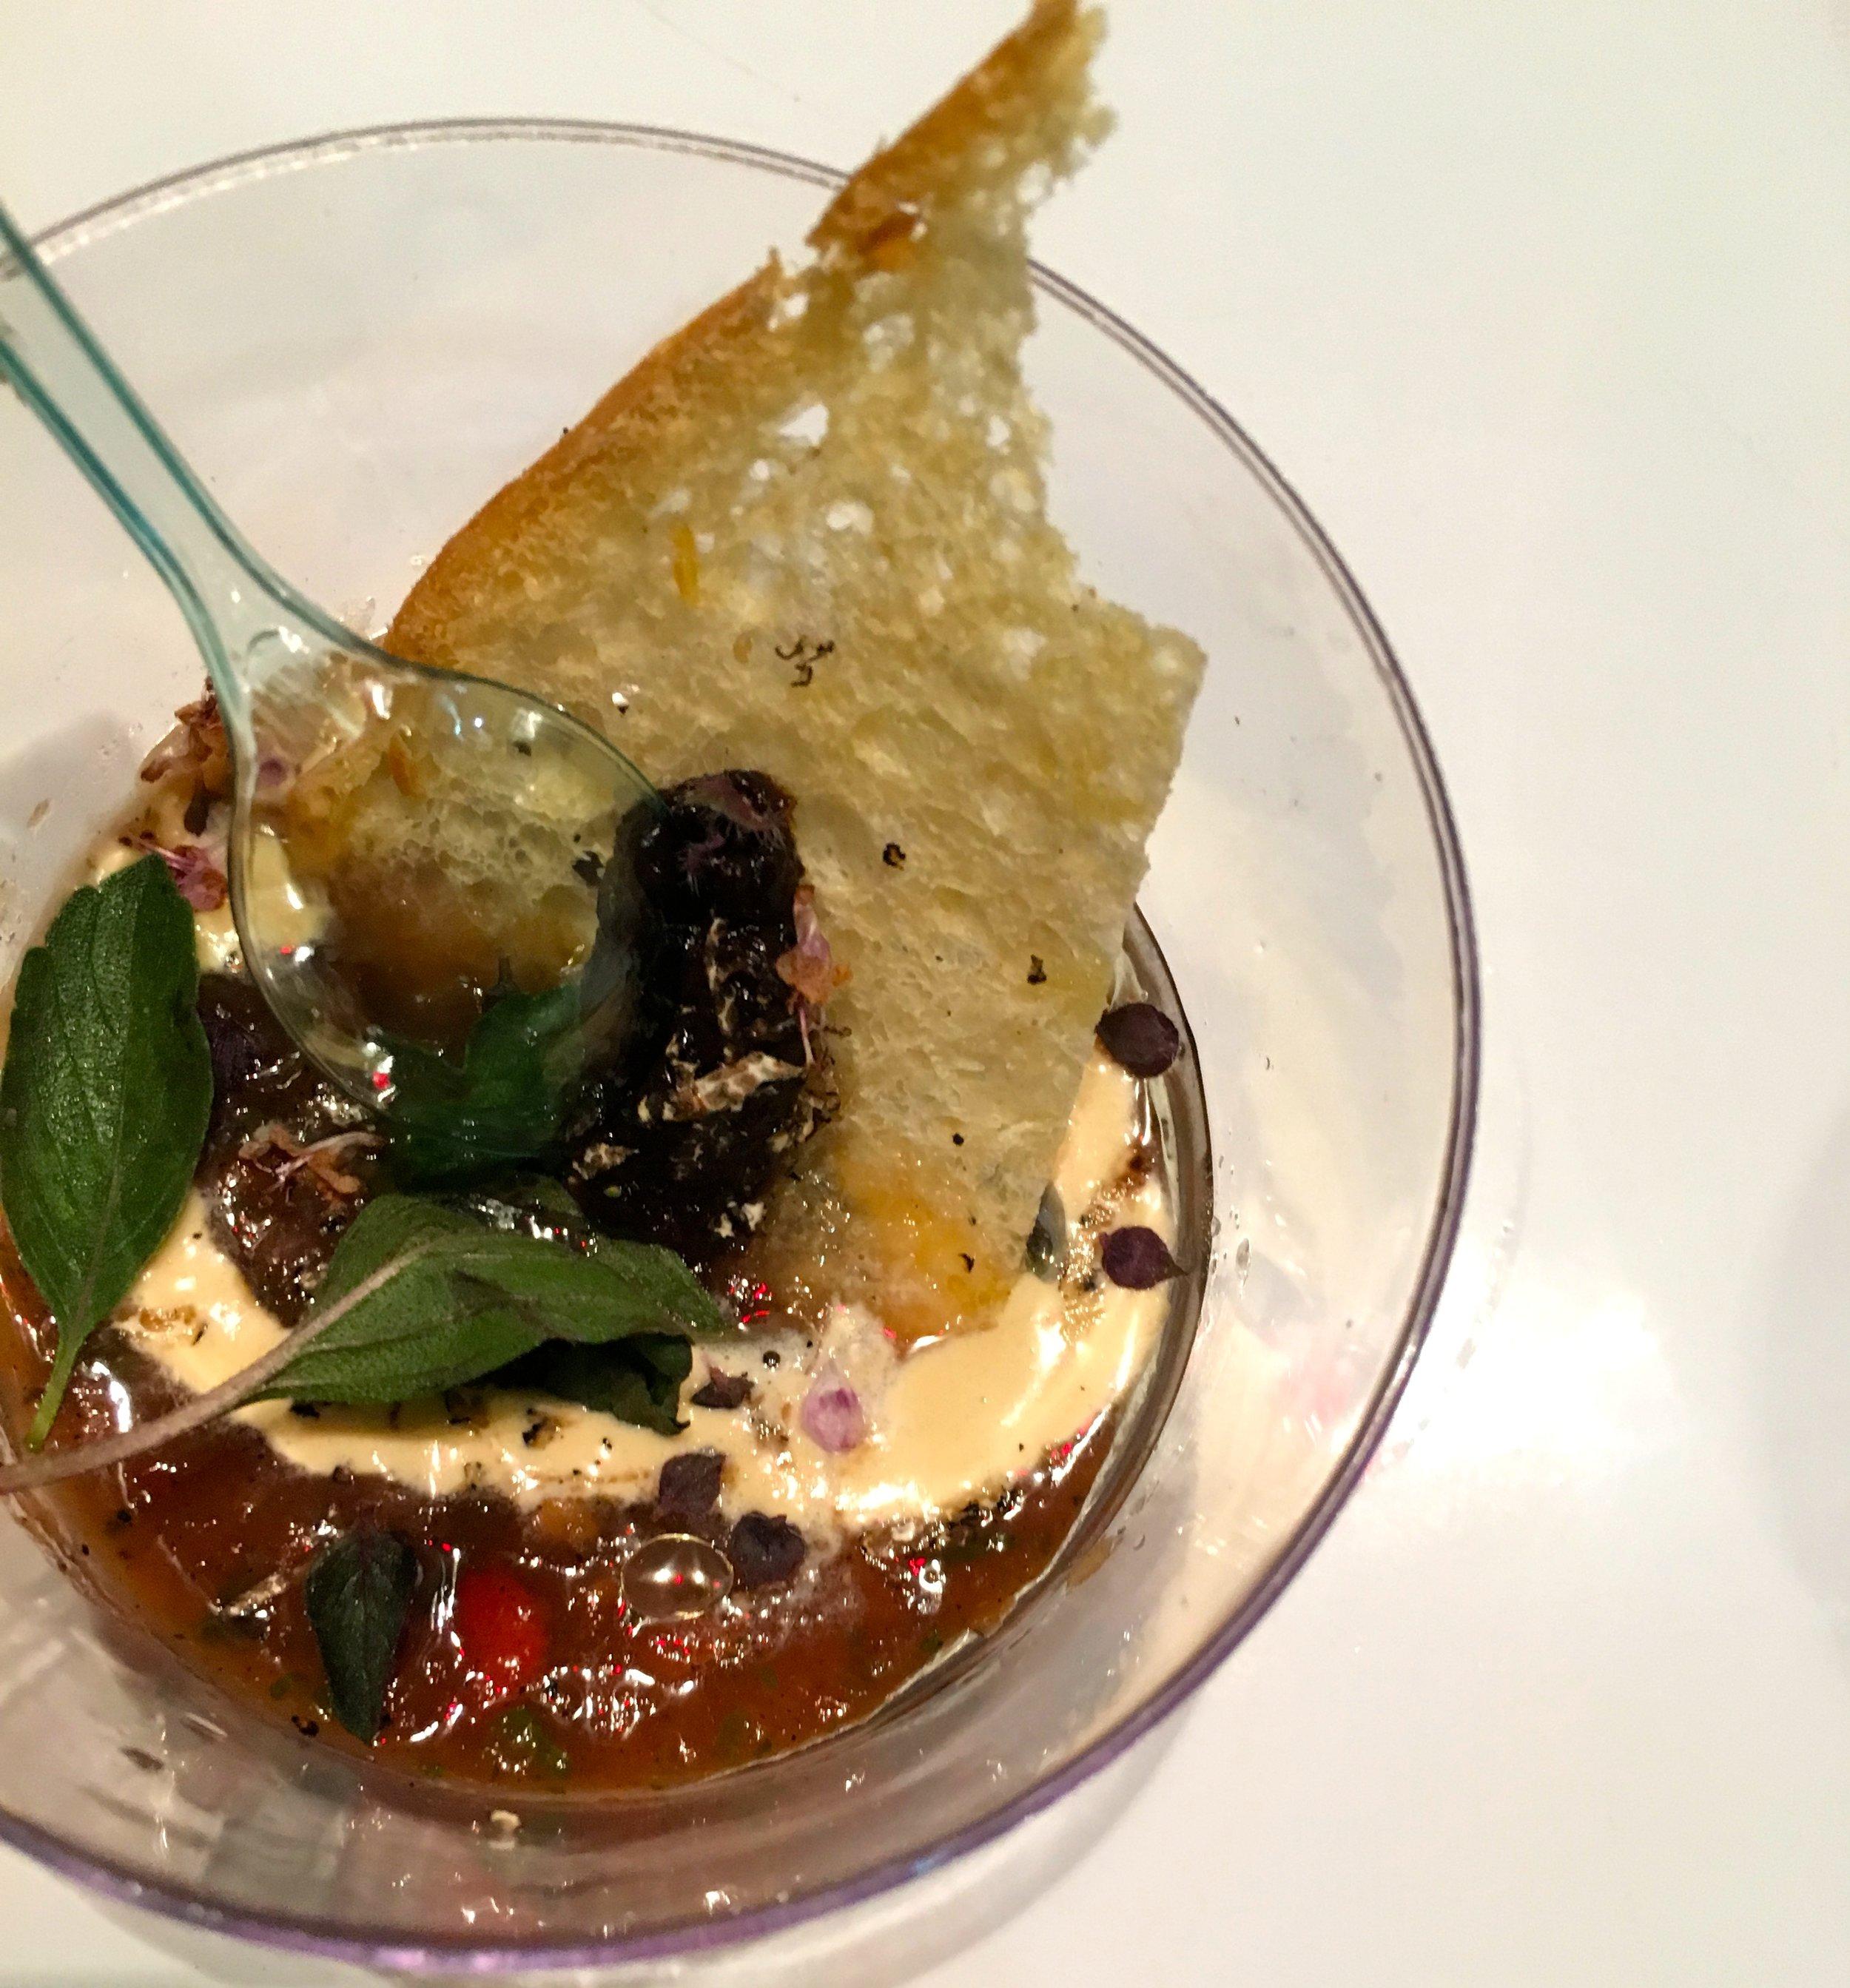 Truffled tomato gazpacho, whipped uni mascarpone, basil blossoms, charcoal roasted garlic toast. Chef Dakota Weiss. Estrella Sunset. Los Angeles.